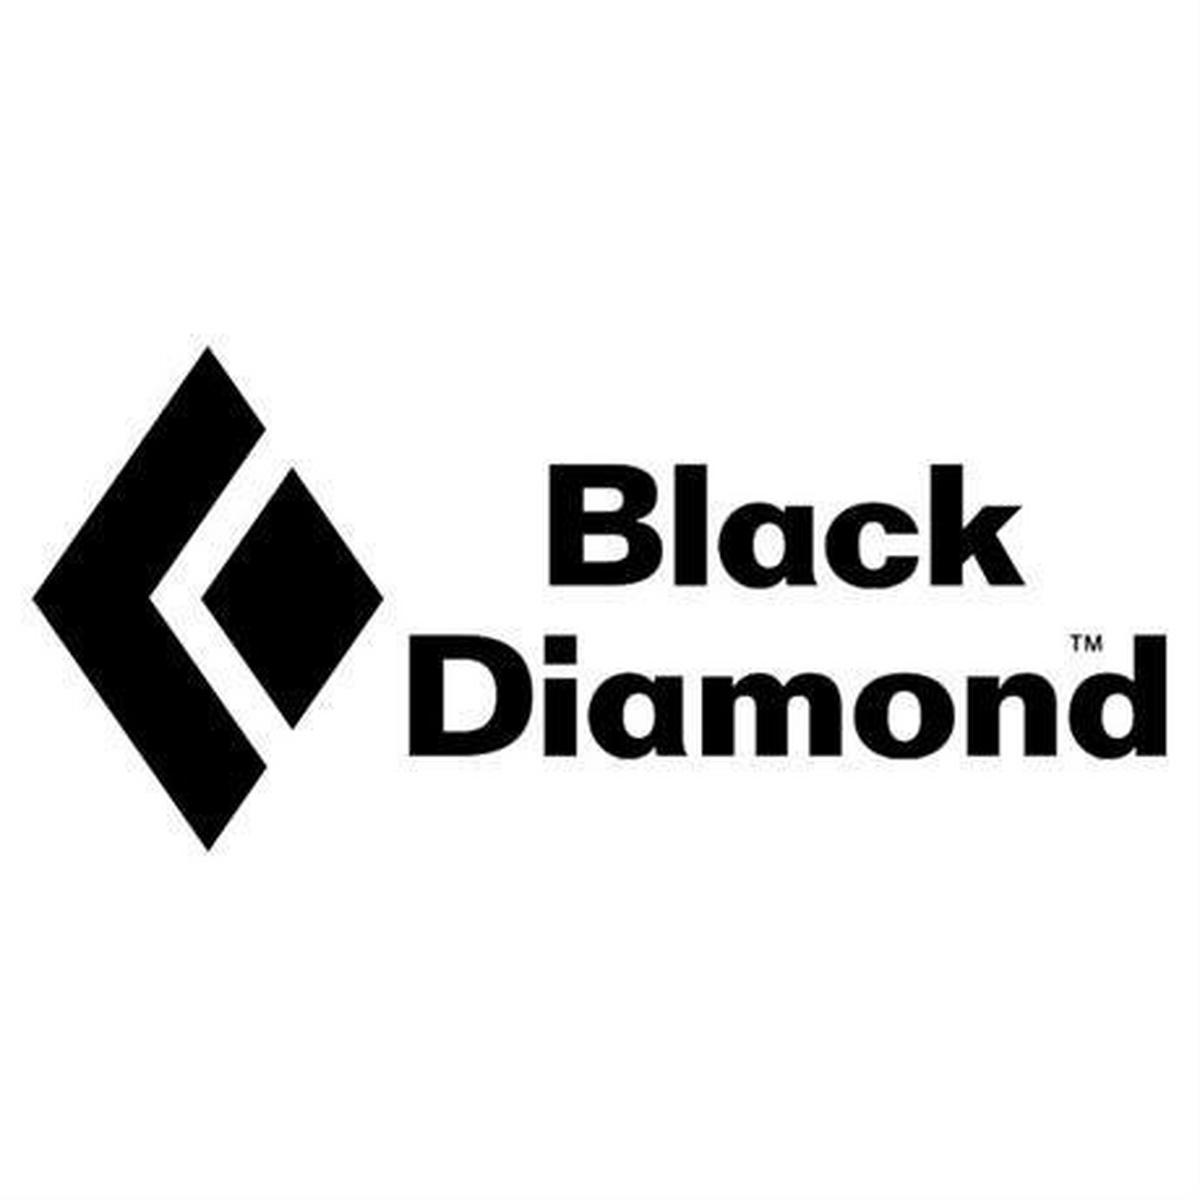 Black Diamond Ice Axe Spare/Accessory Head Protector